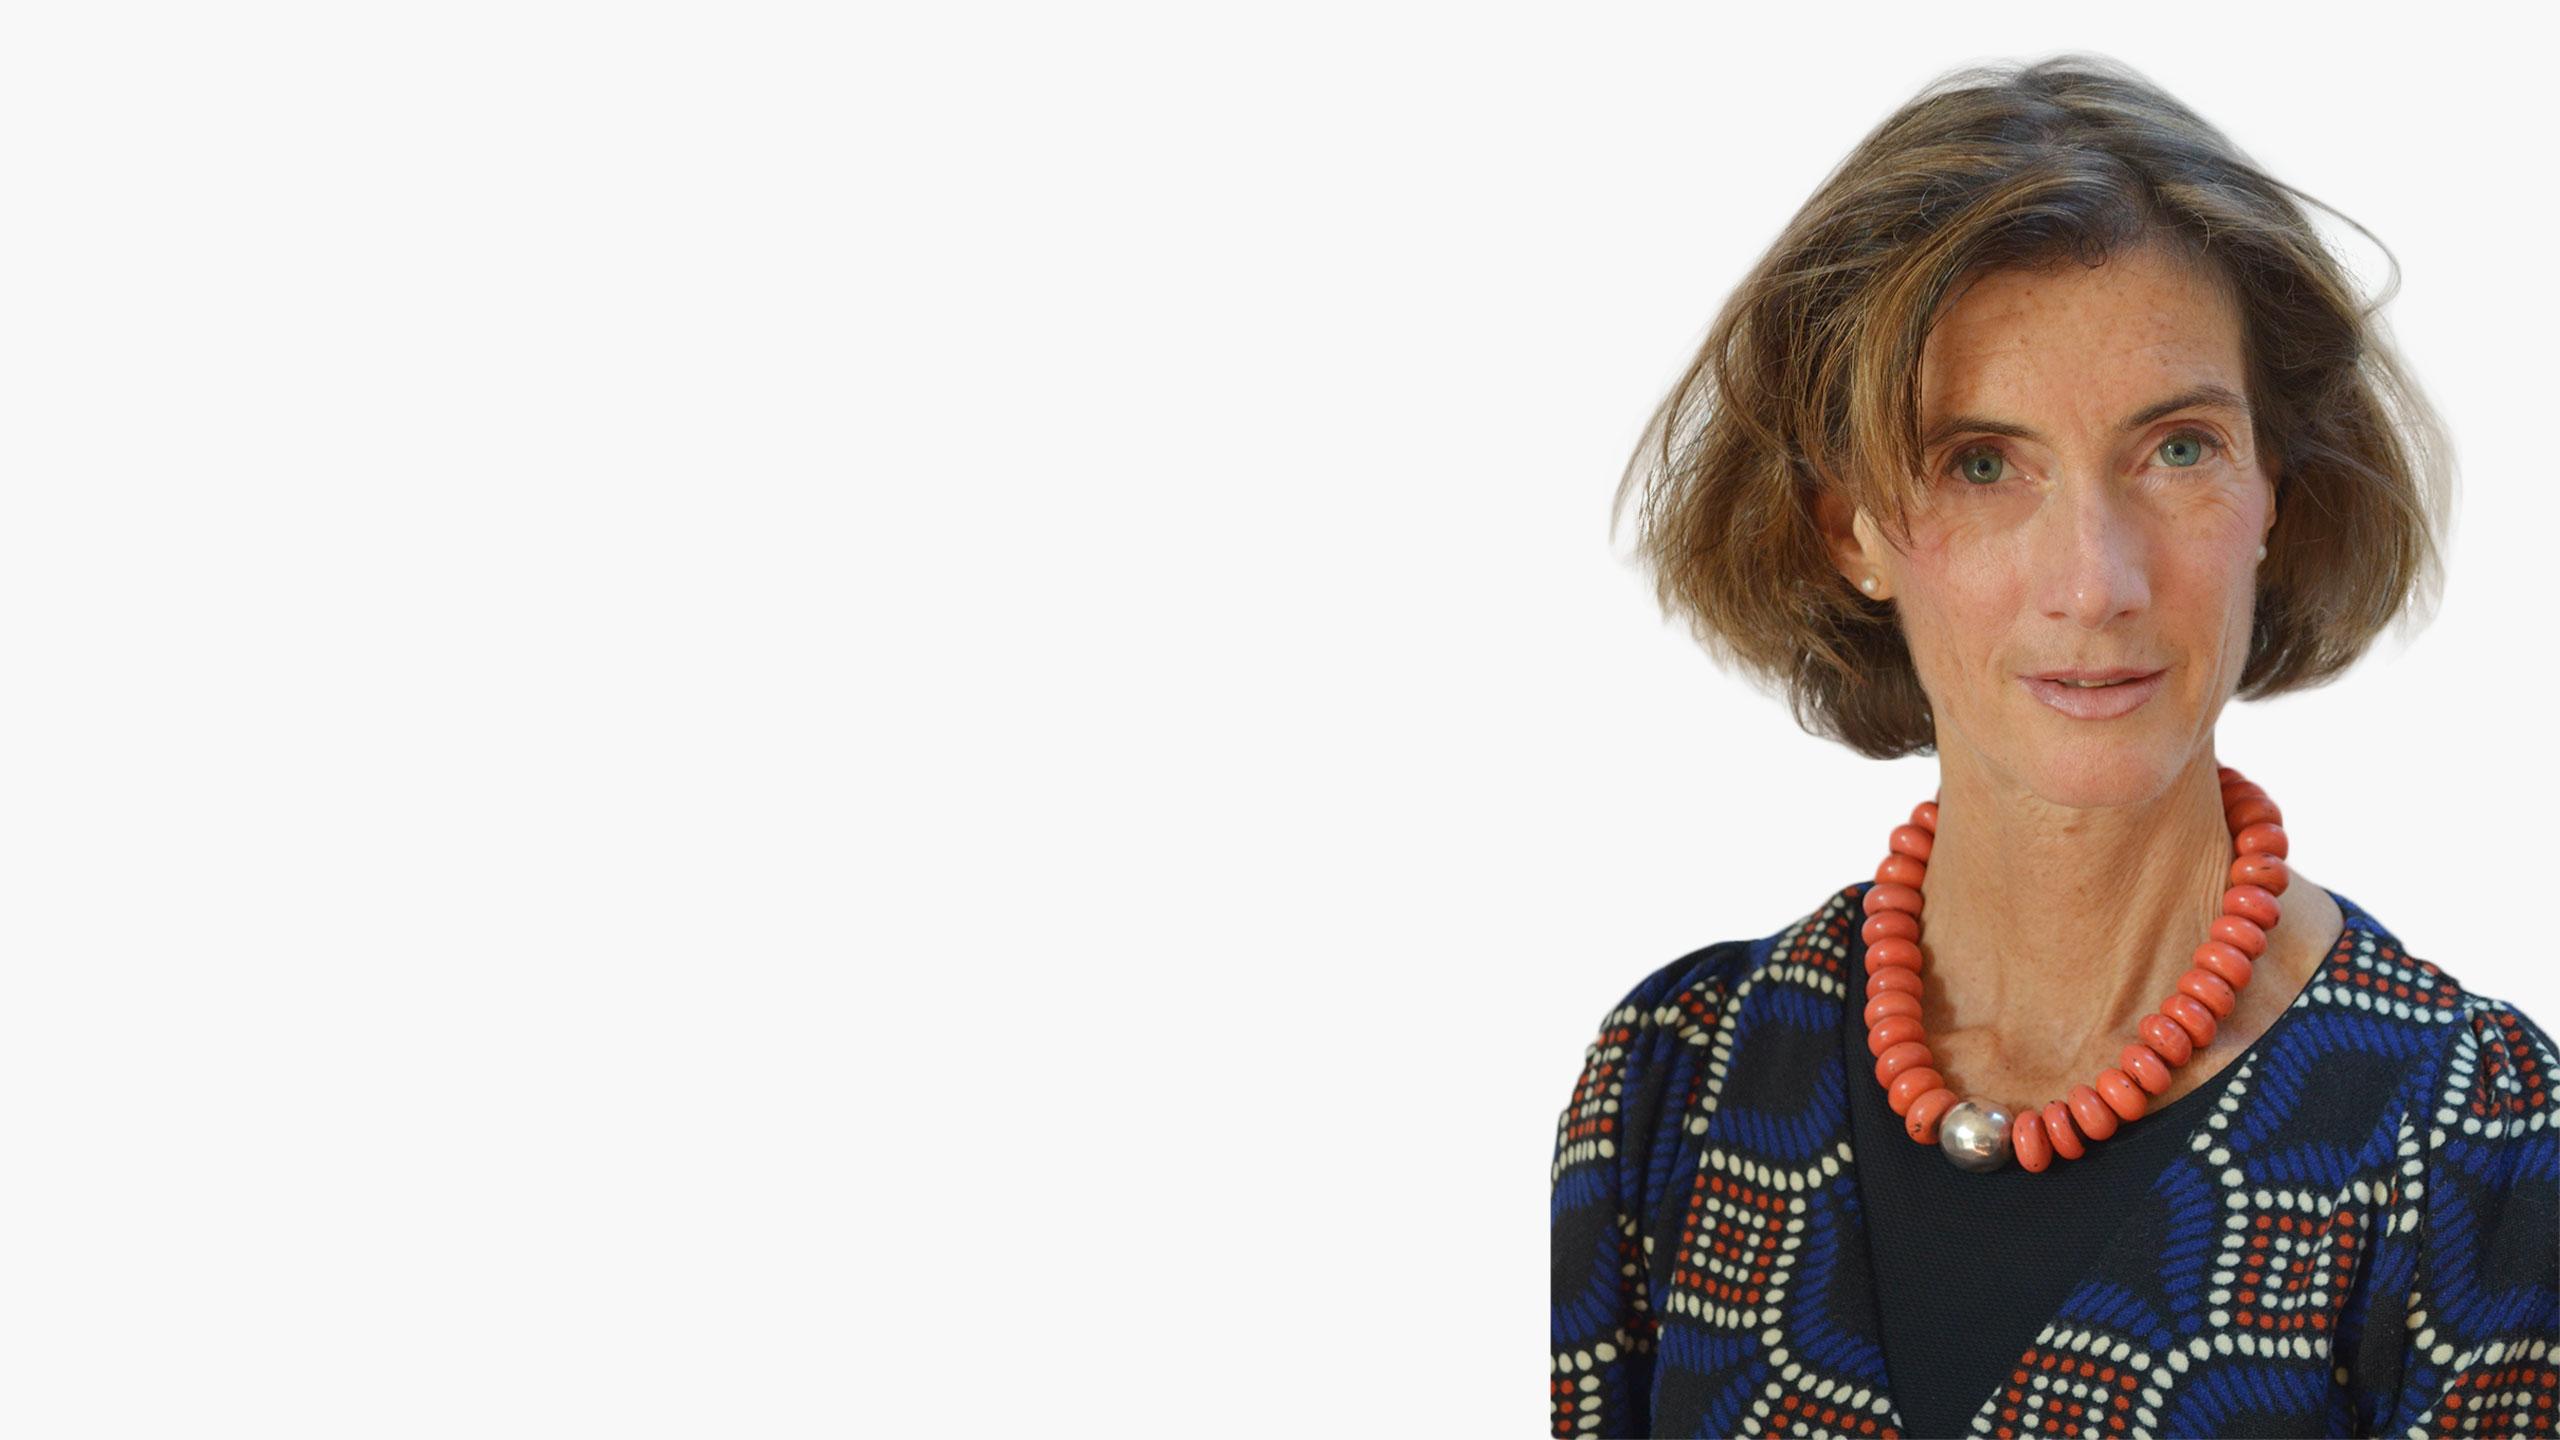 Dr. Claudia Lennkh-Wolfsberg